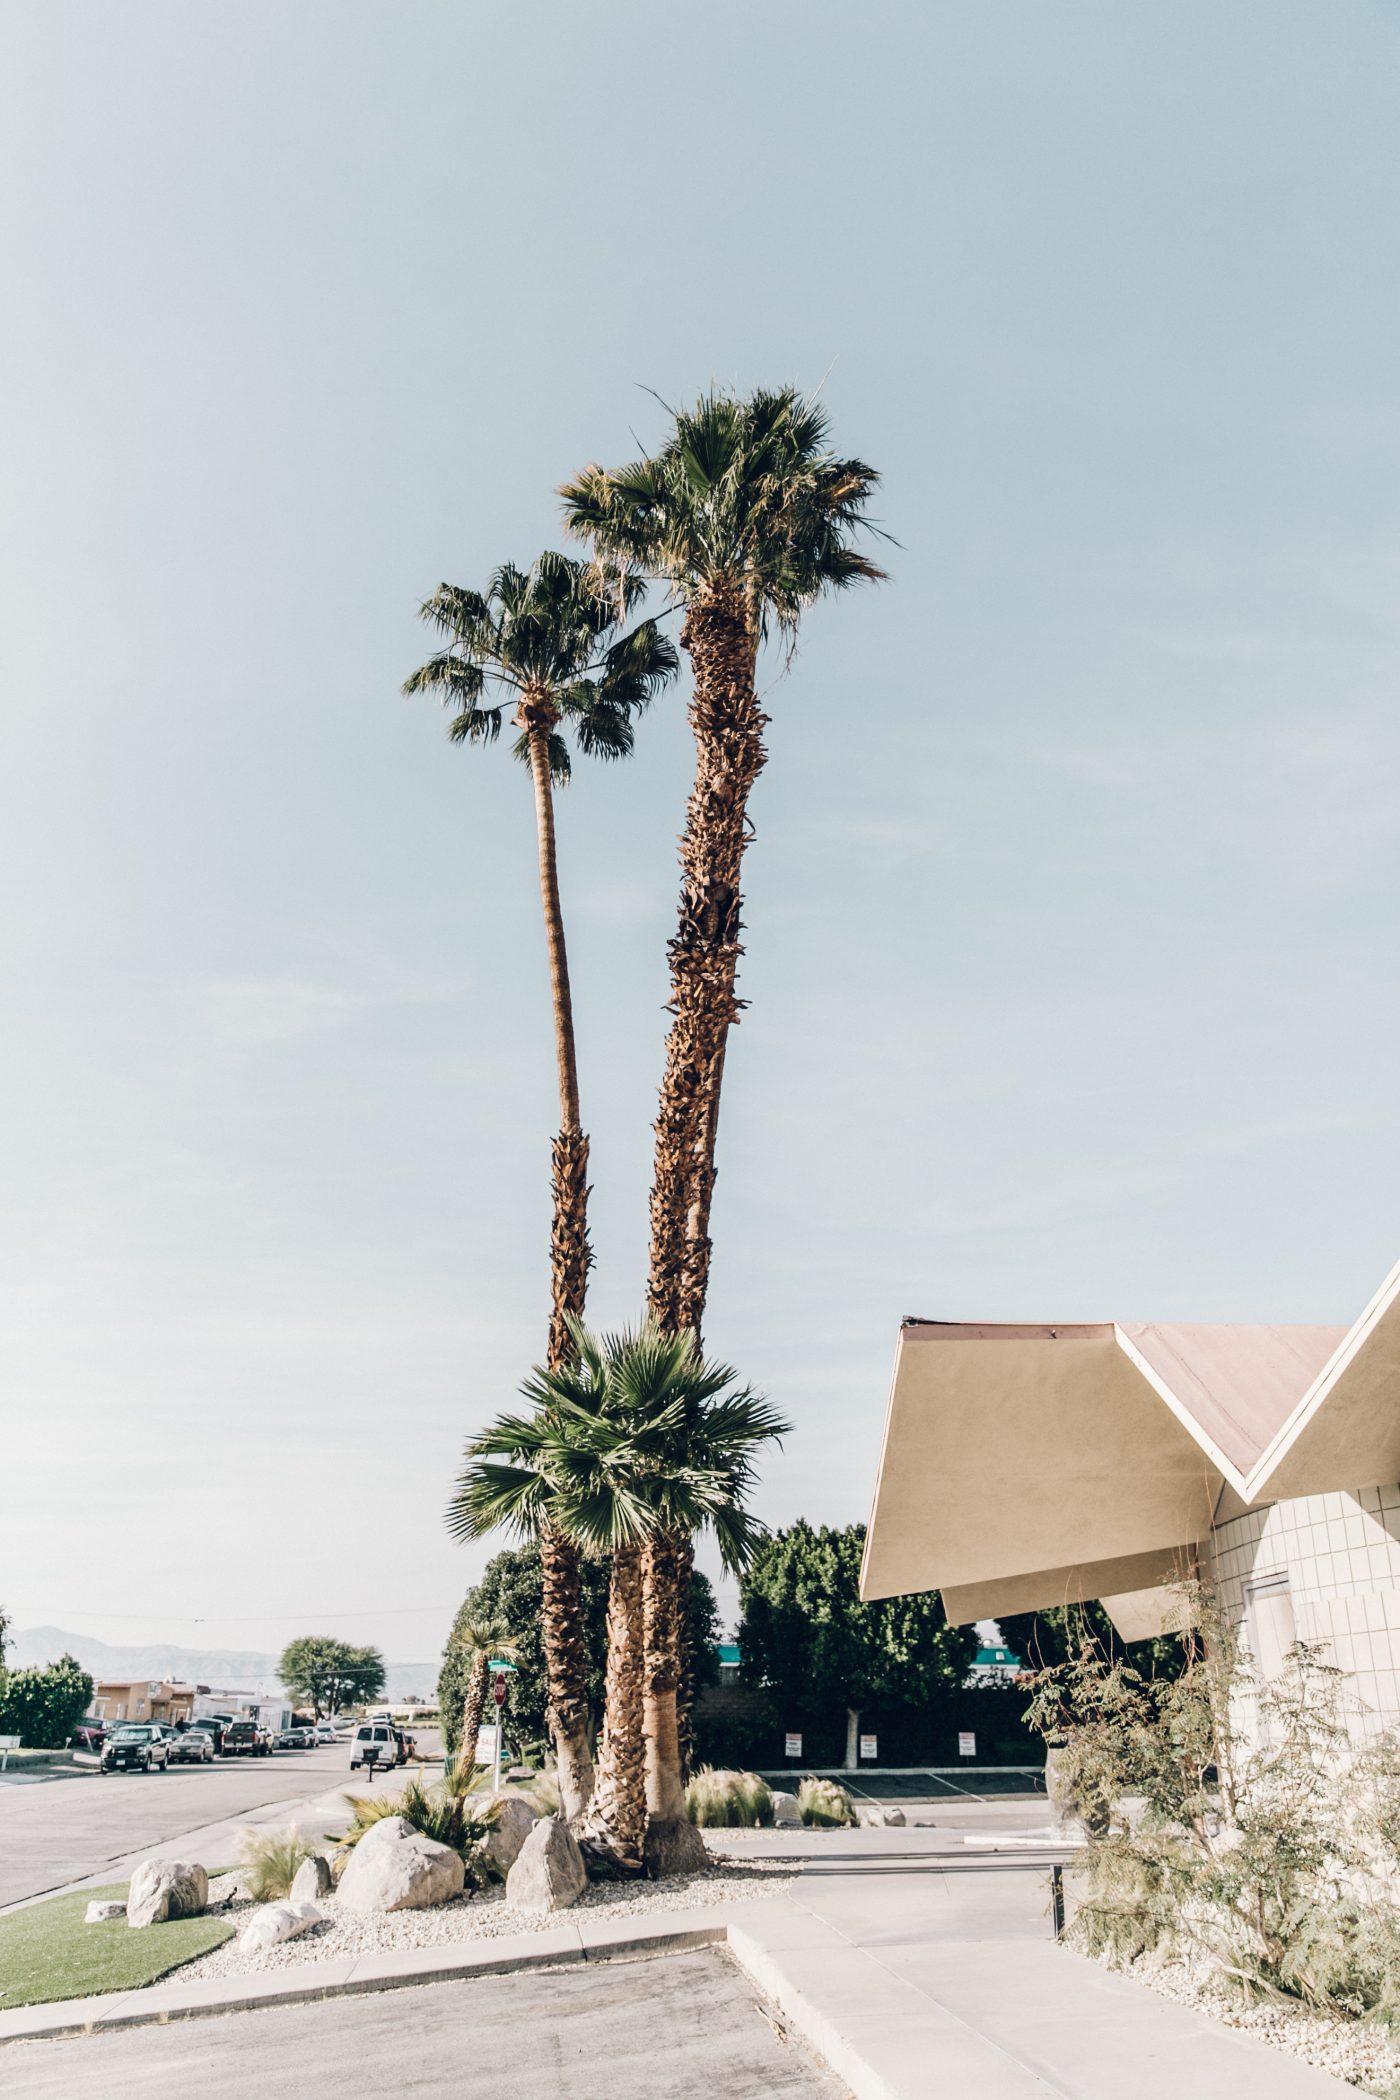 Denim_Jacket-Saint_Laurent-Chloe_Top-Suede_Skirt-Chloe_Hudson_Bag-Espadrilles-Coachella-Palm_Springs-Outfit-Collage_Vintage-70